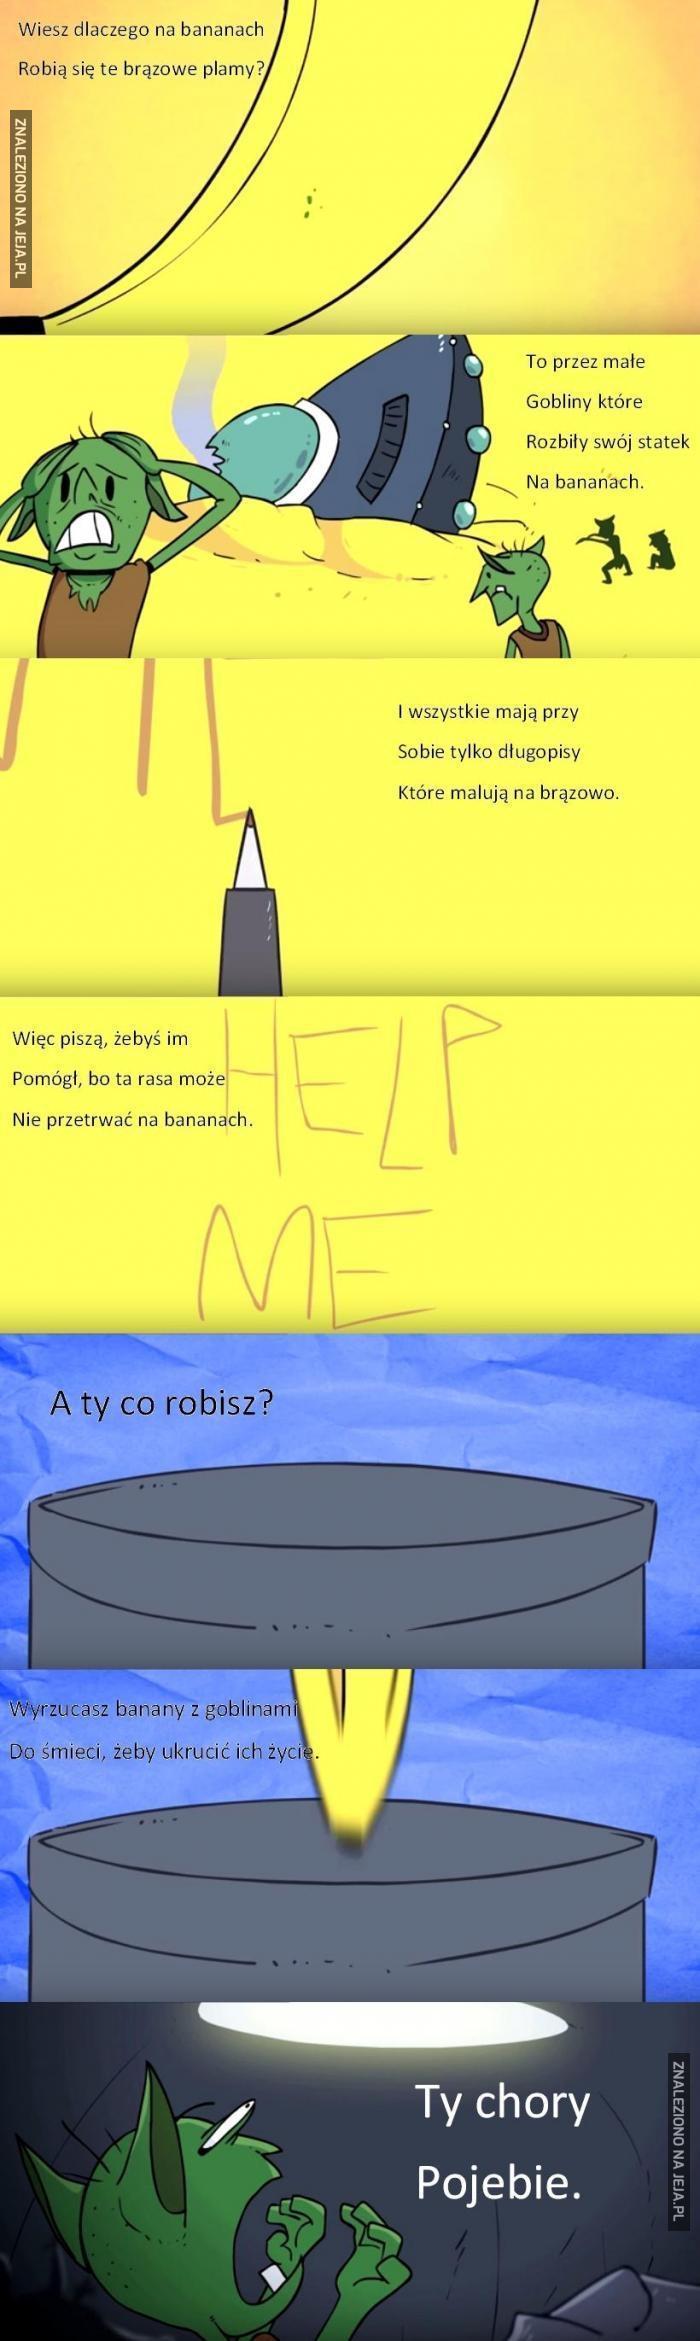 Biedne gobliny